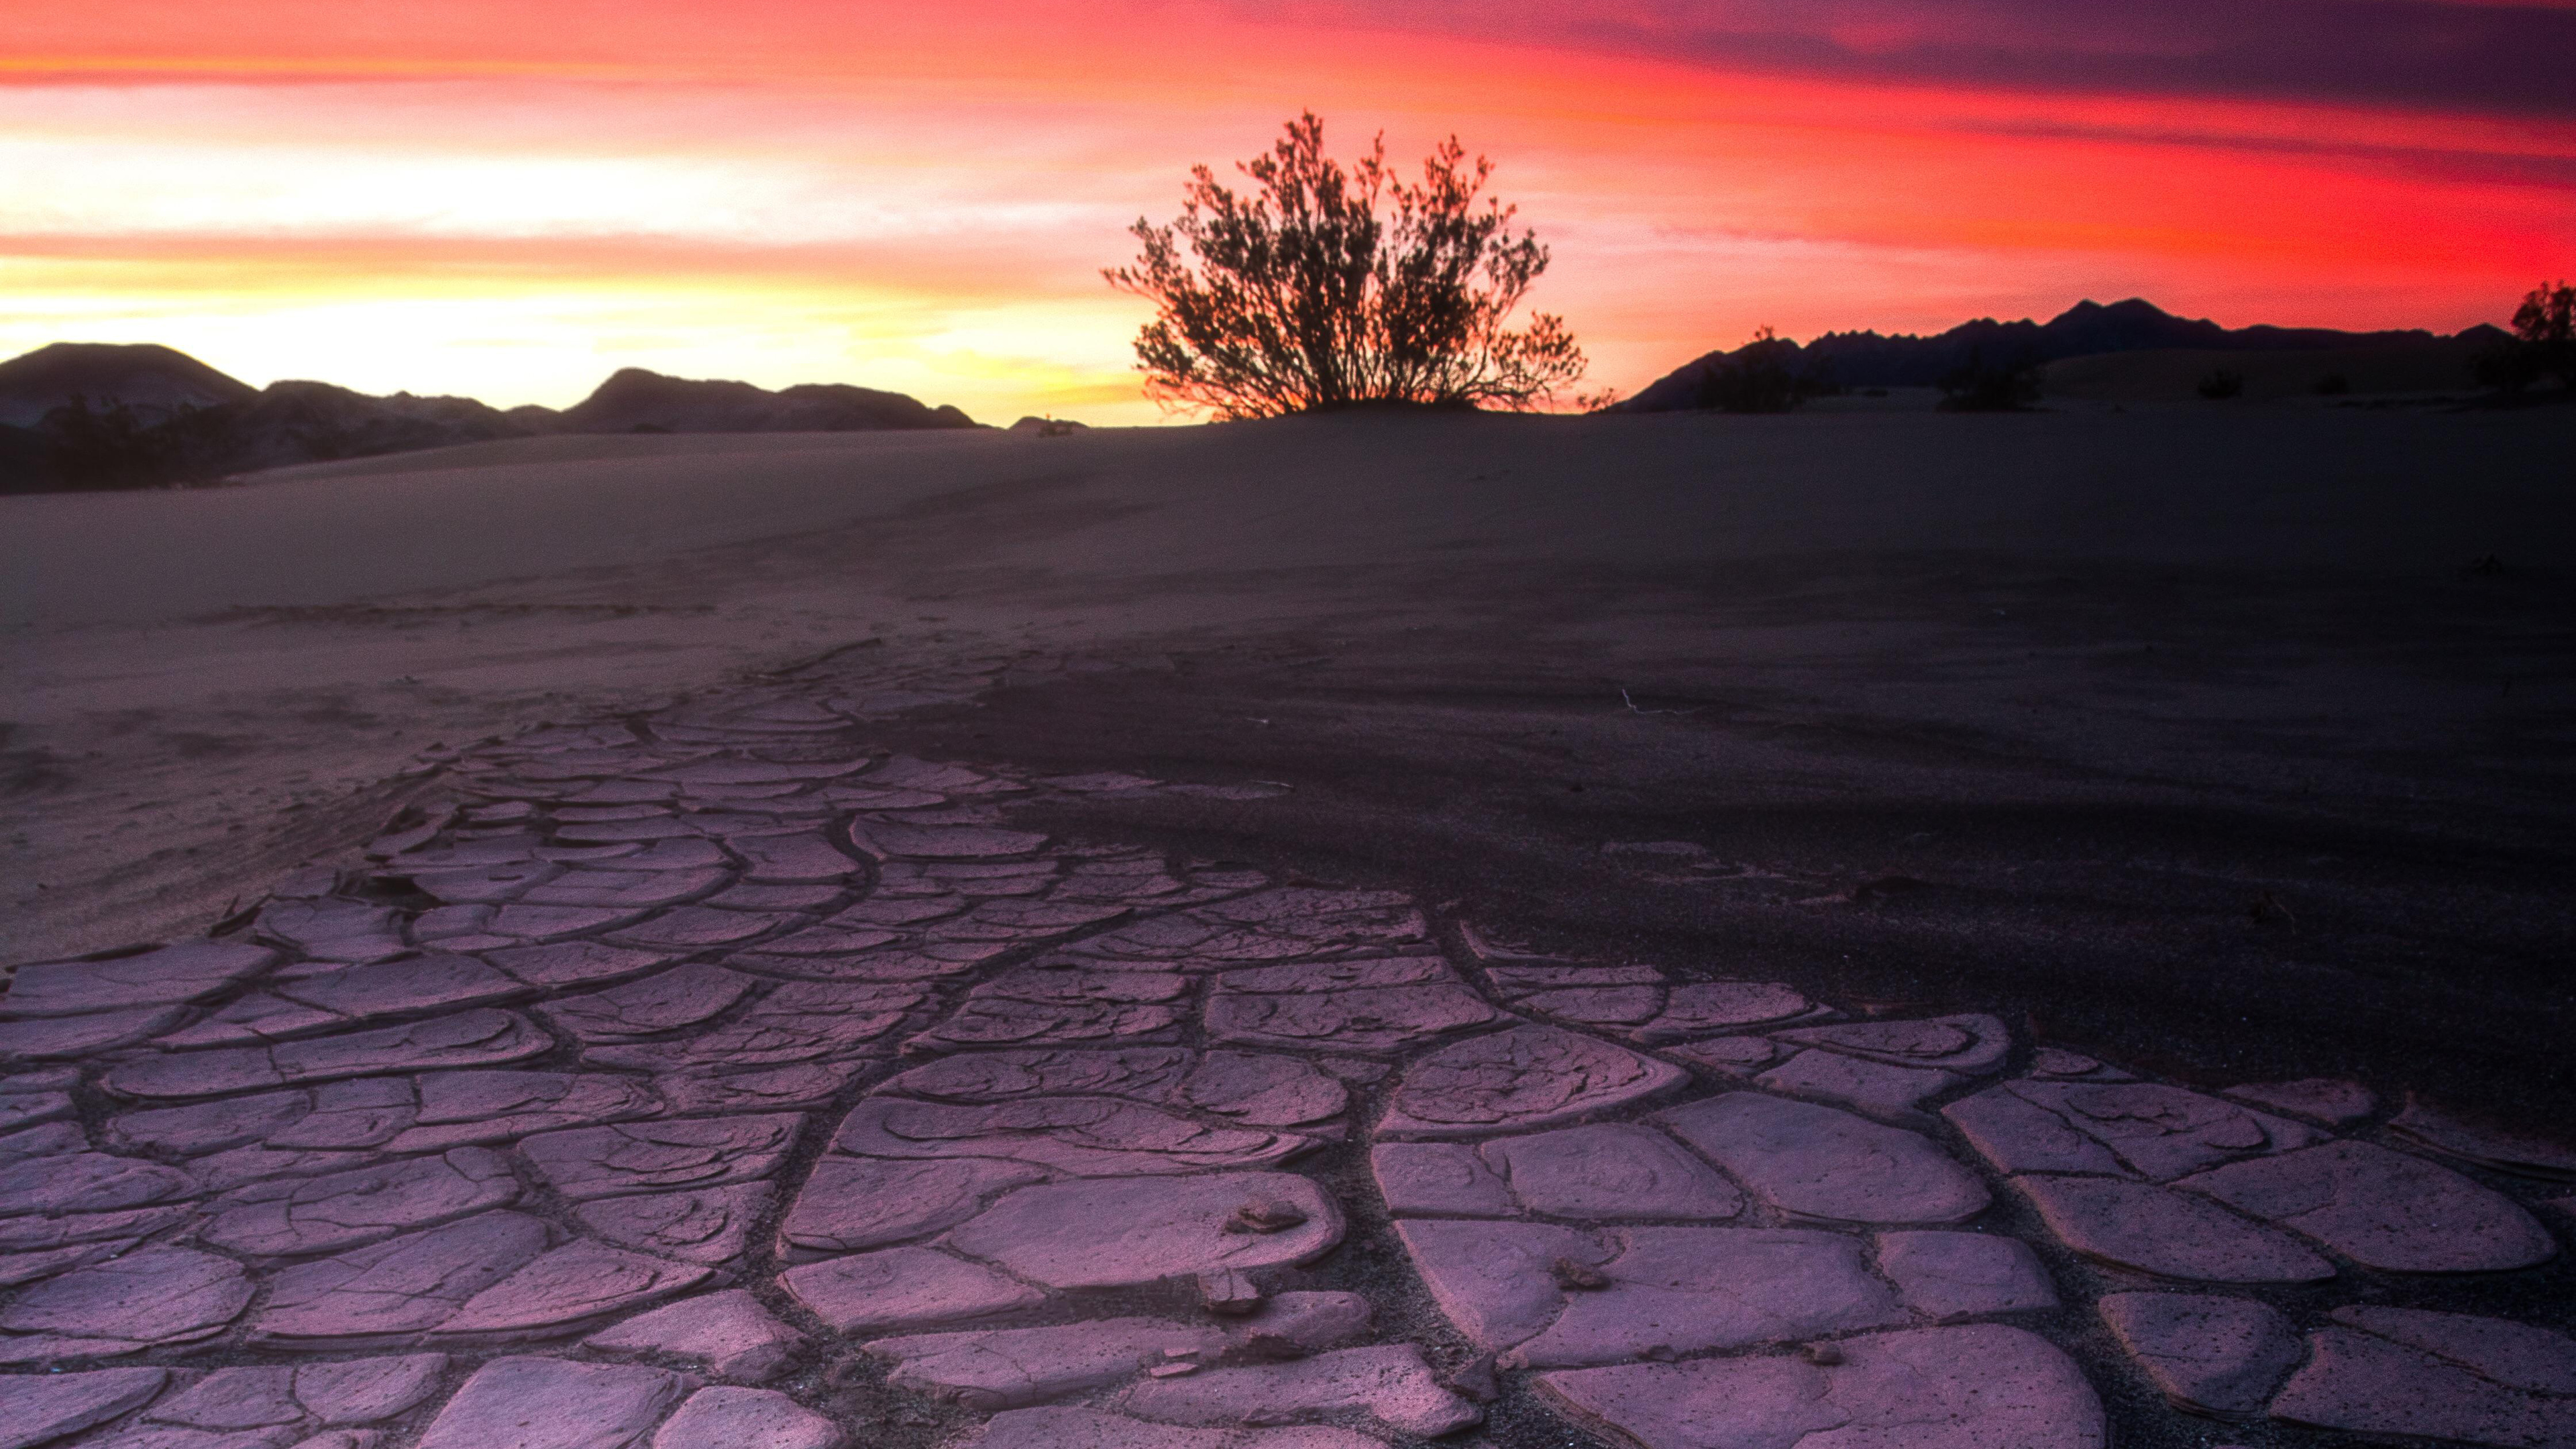 death valley mud crack lone tree 4k 1551644662 - Death Valley Mud Crack Lone Tree 4k - tree wallpapers, nature wallpapers, hd-wallpapers, 4k-wallpapers